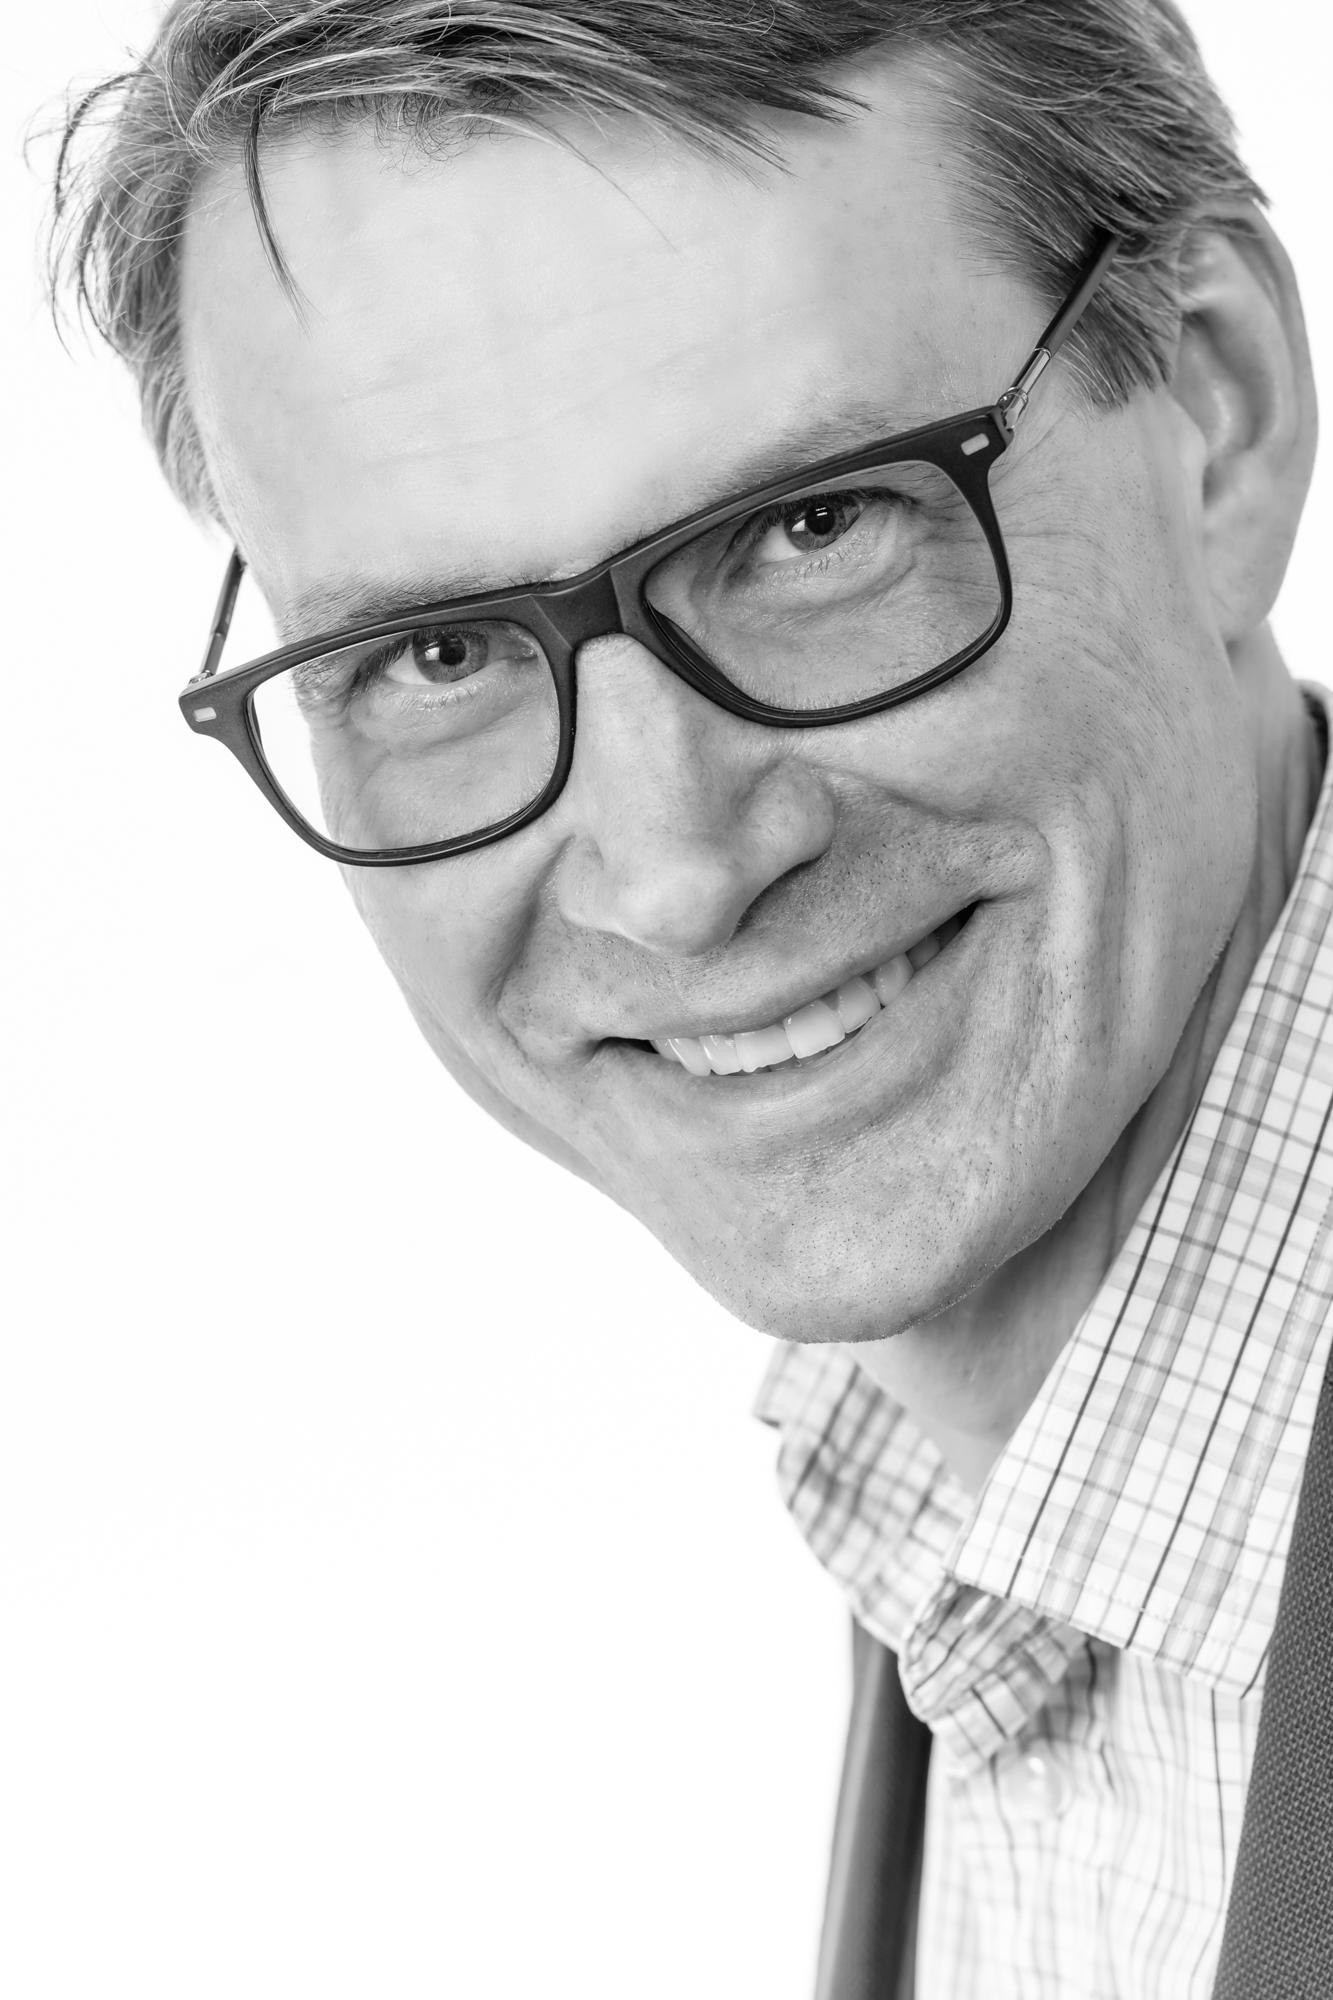 Olle Leckne, Fotograf Tommy Jansson, www.tommyjansson.com